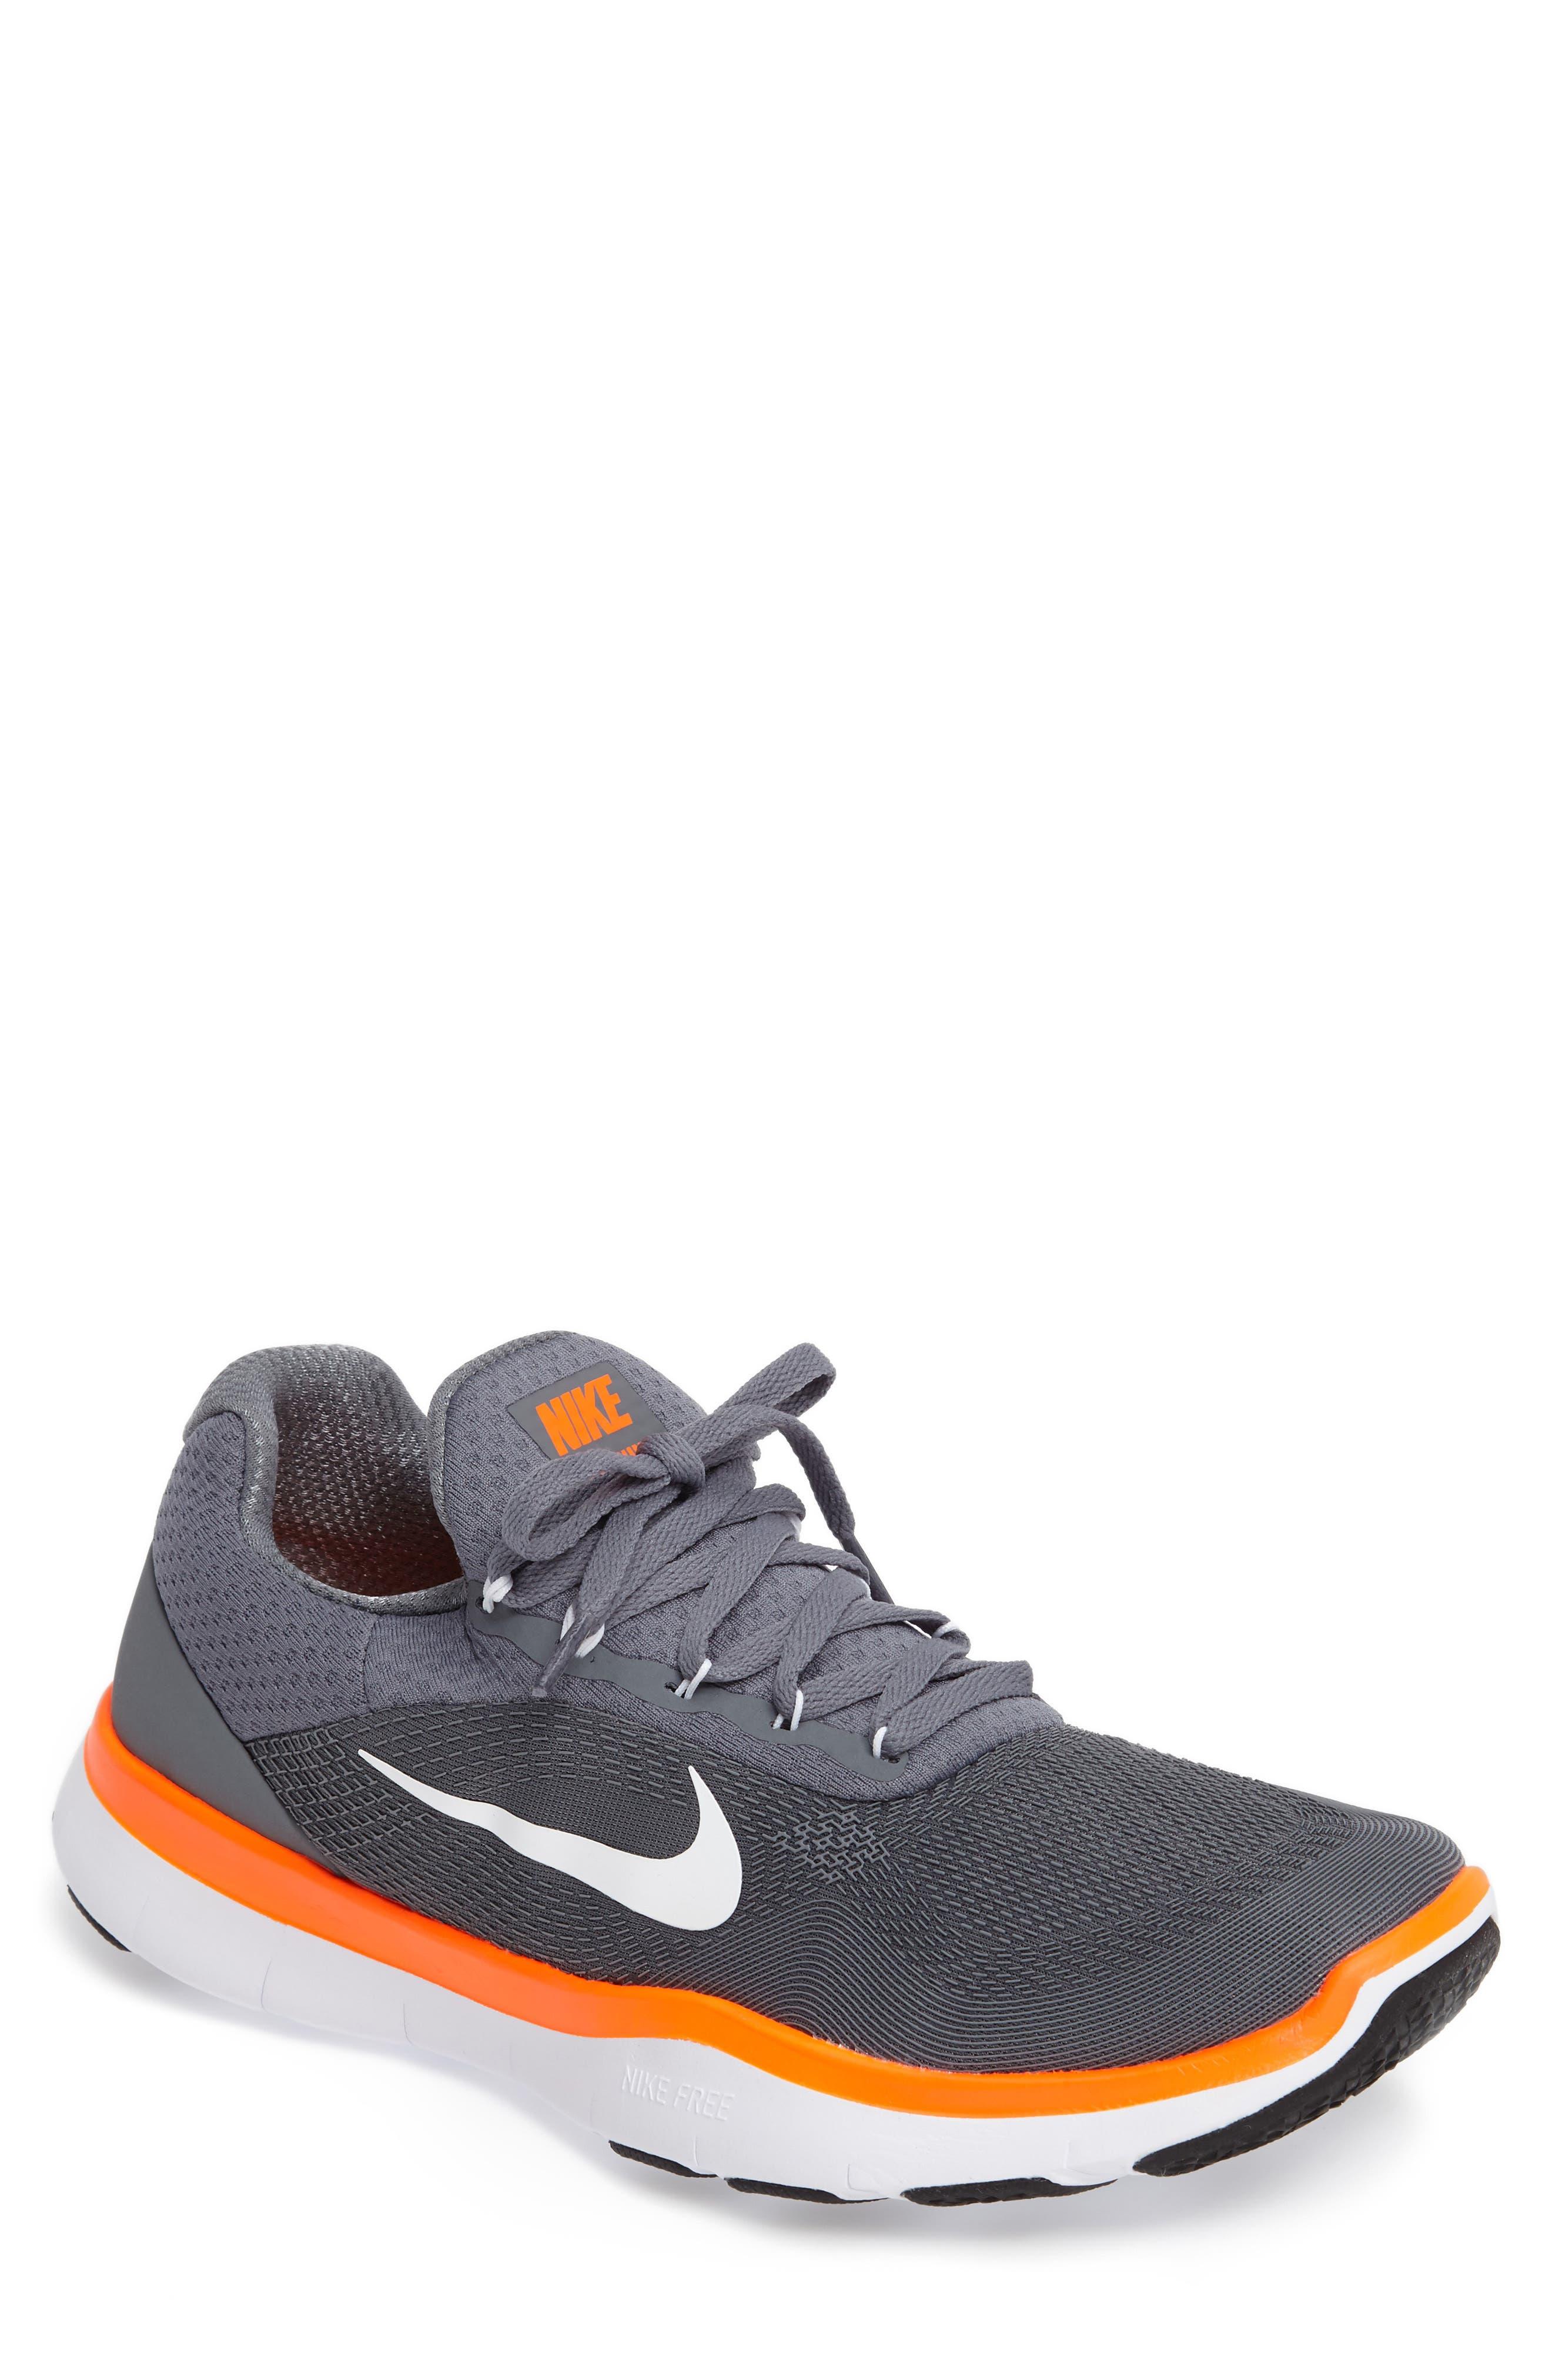 Main Image - Nike Free Trainer V7 Training Shoe (Men)